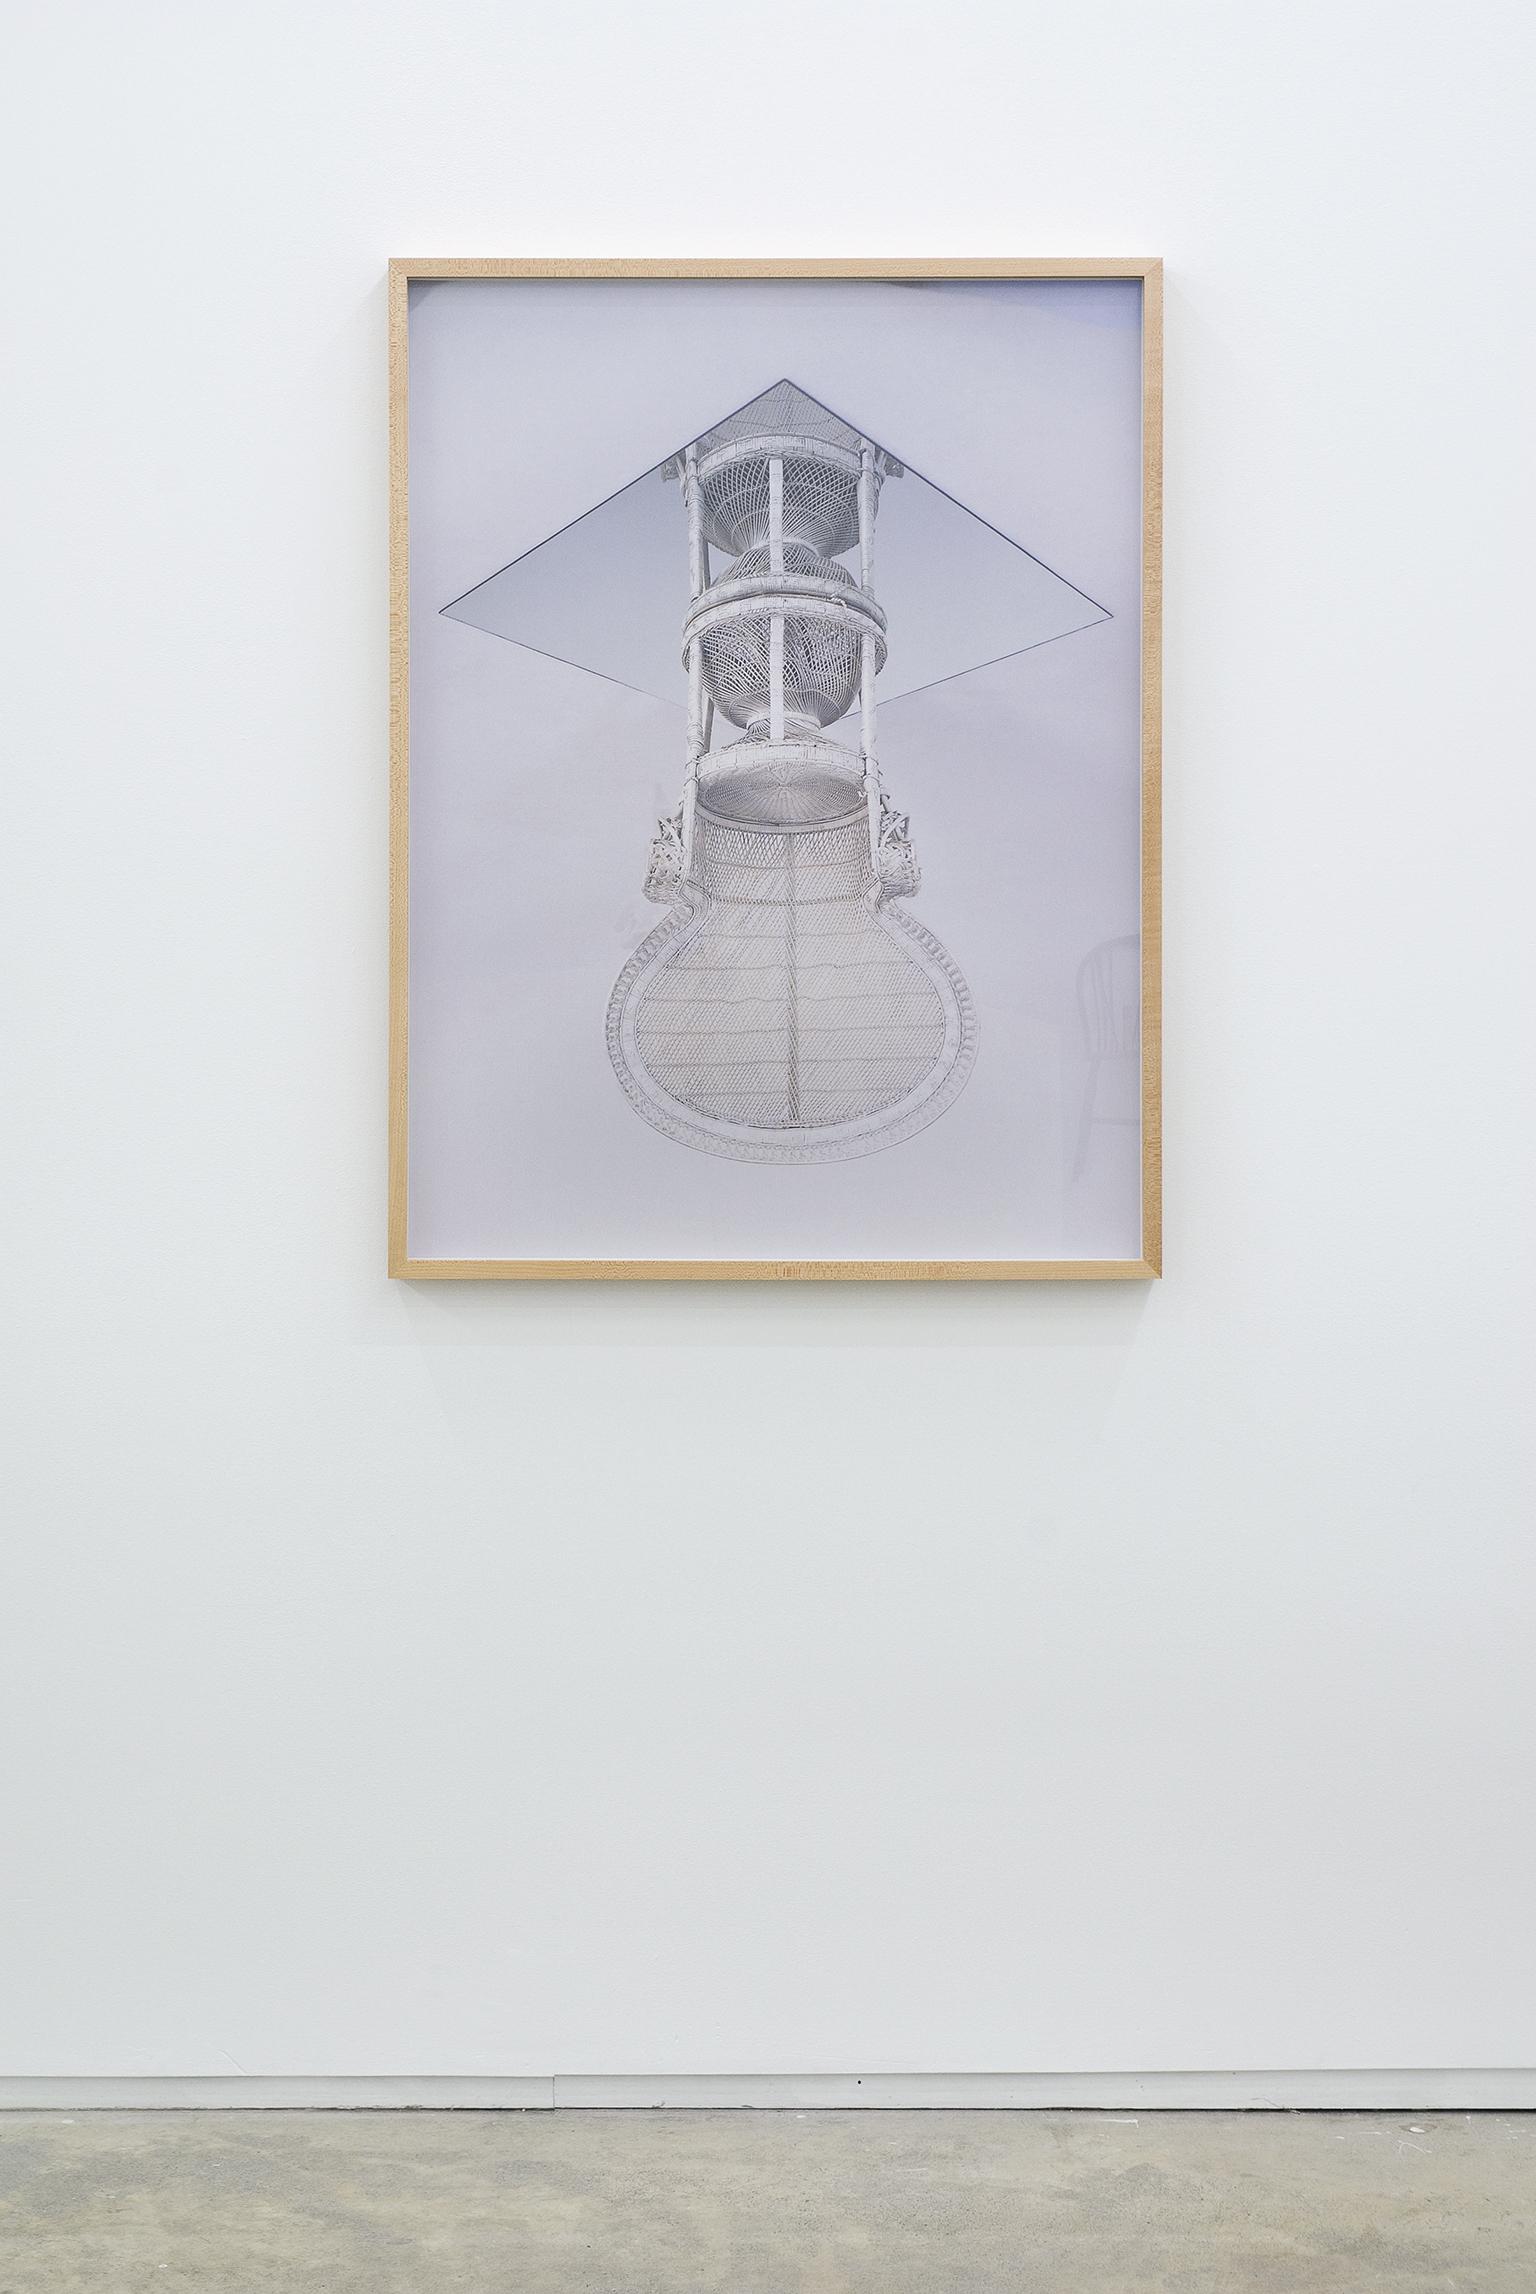 Sam Durant, Huey Newton Chair, 2002, c-print, 40 x 30 in. (102 x 76 cm) by